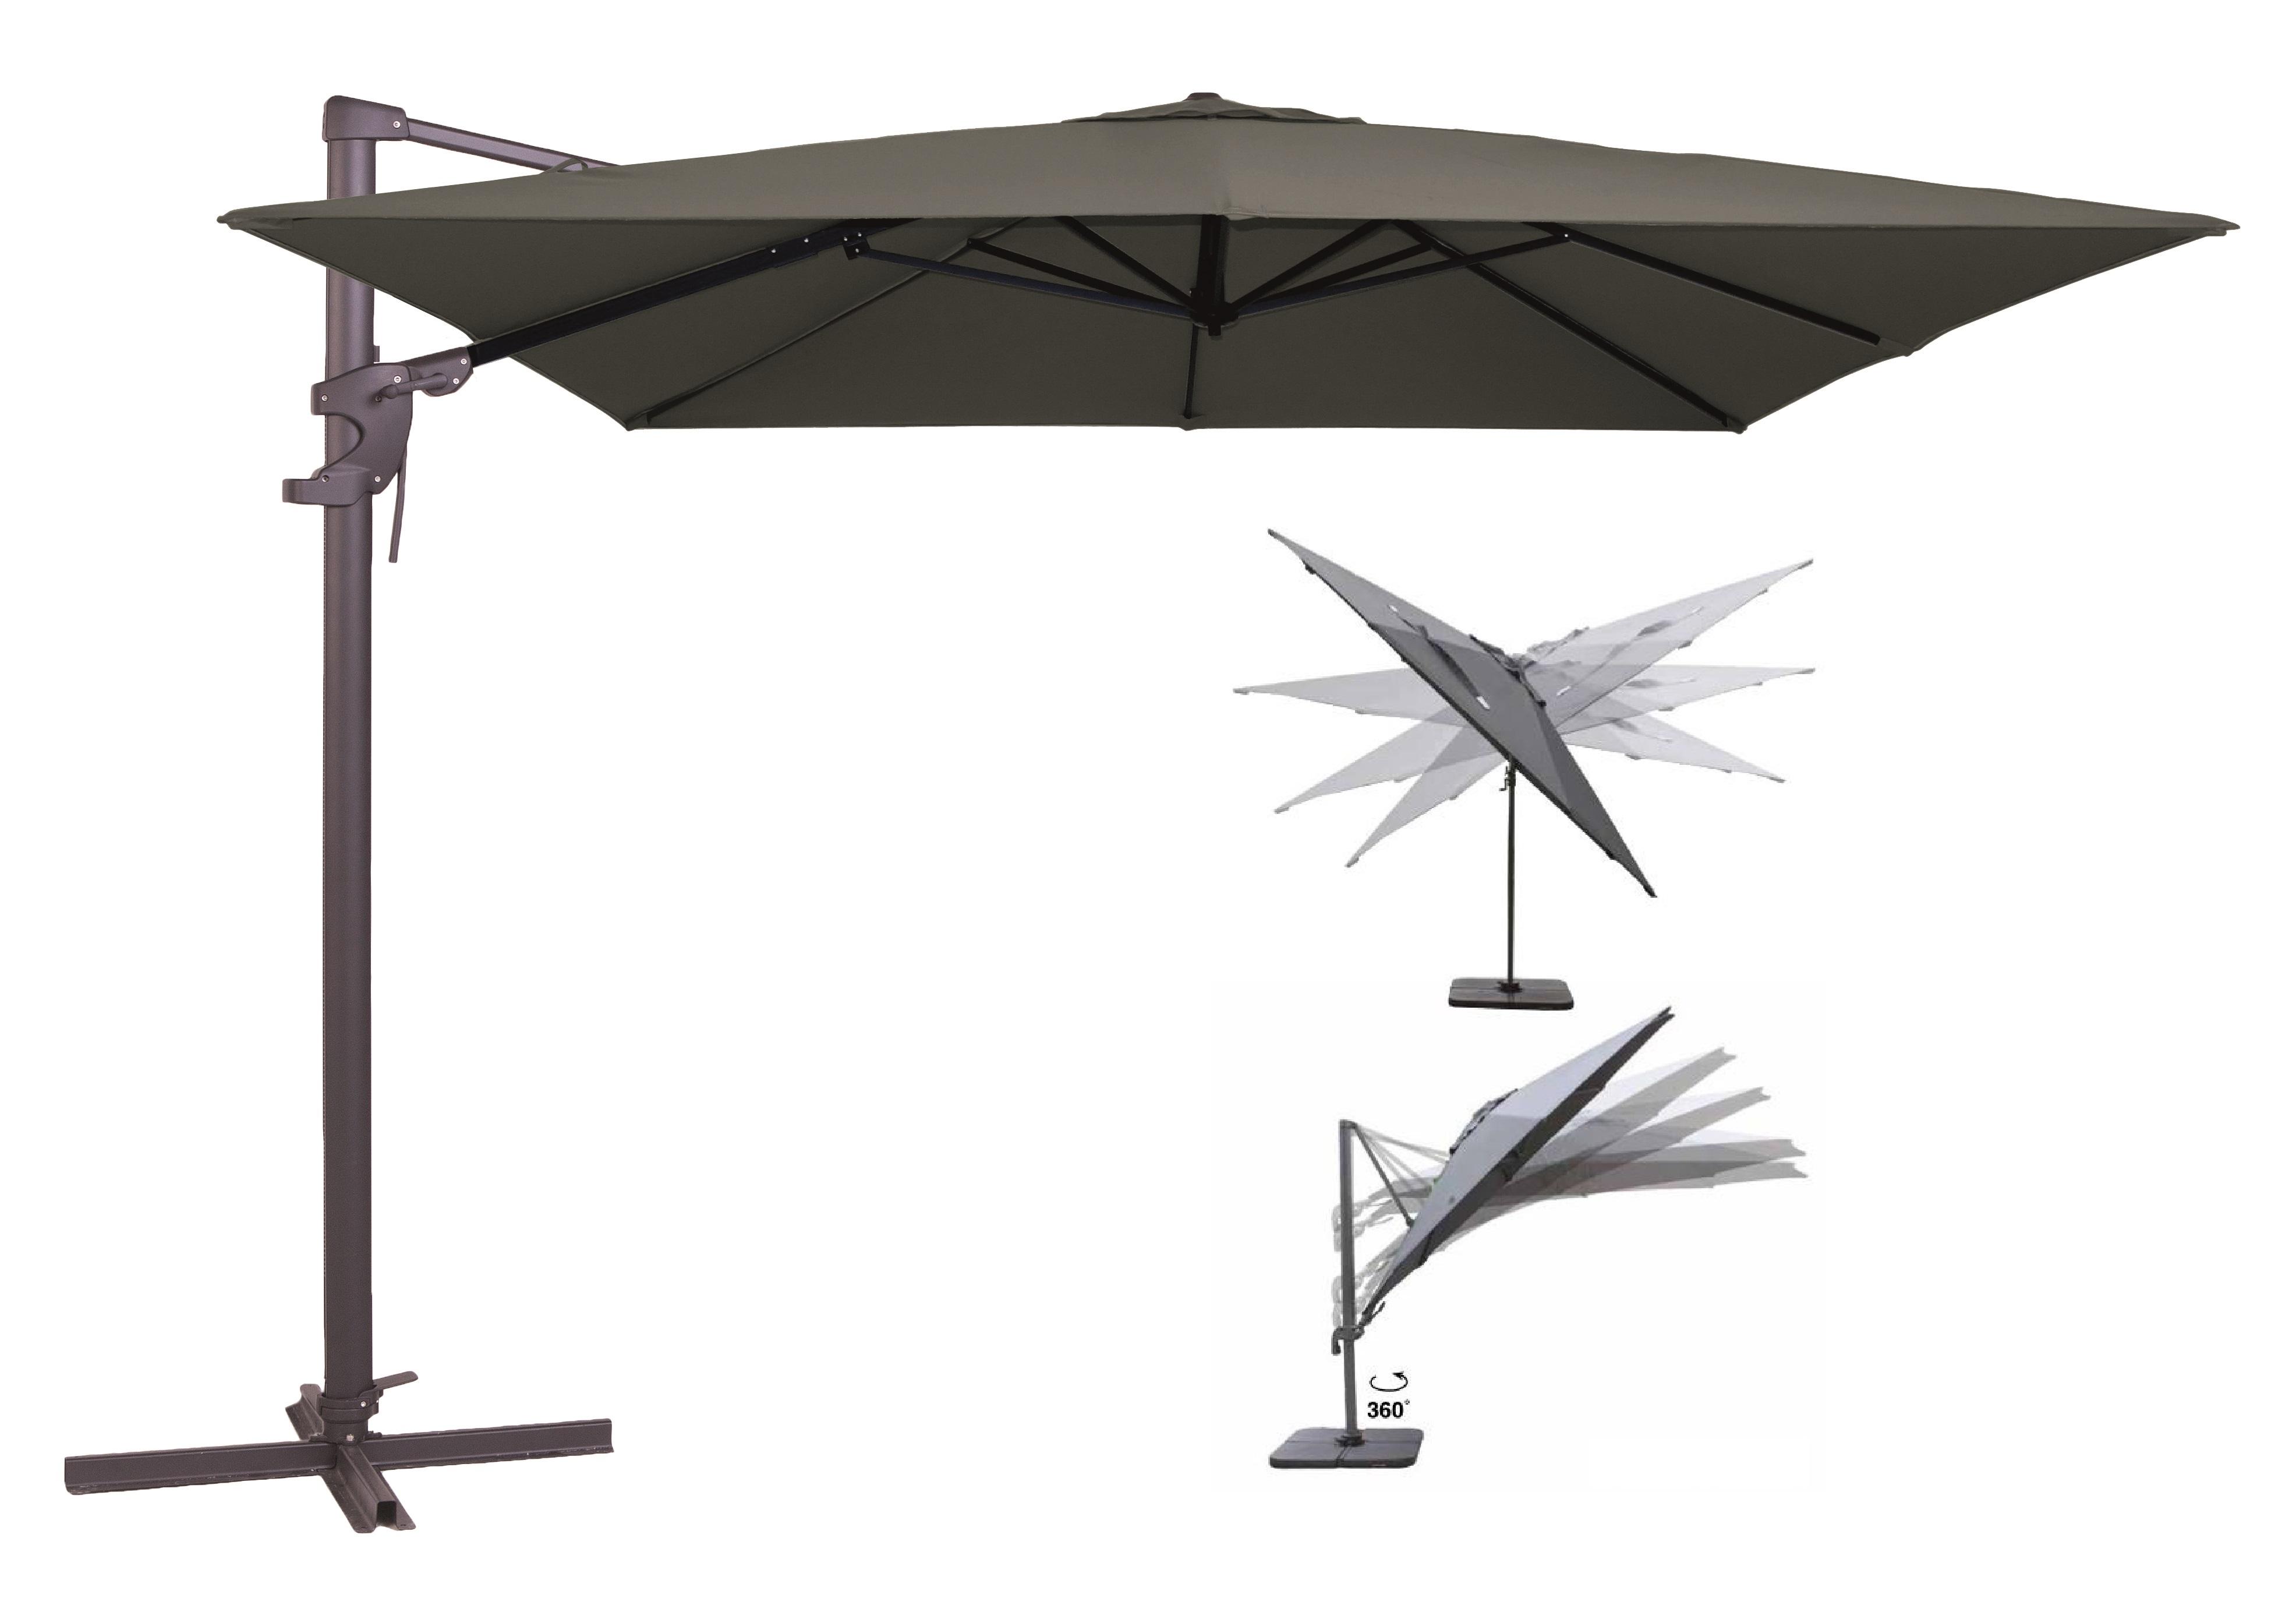 Sonnenschirm Ampelschirm 3x3m Gartenschirm Marktschirm Kurbelschirm Verona